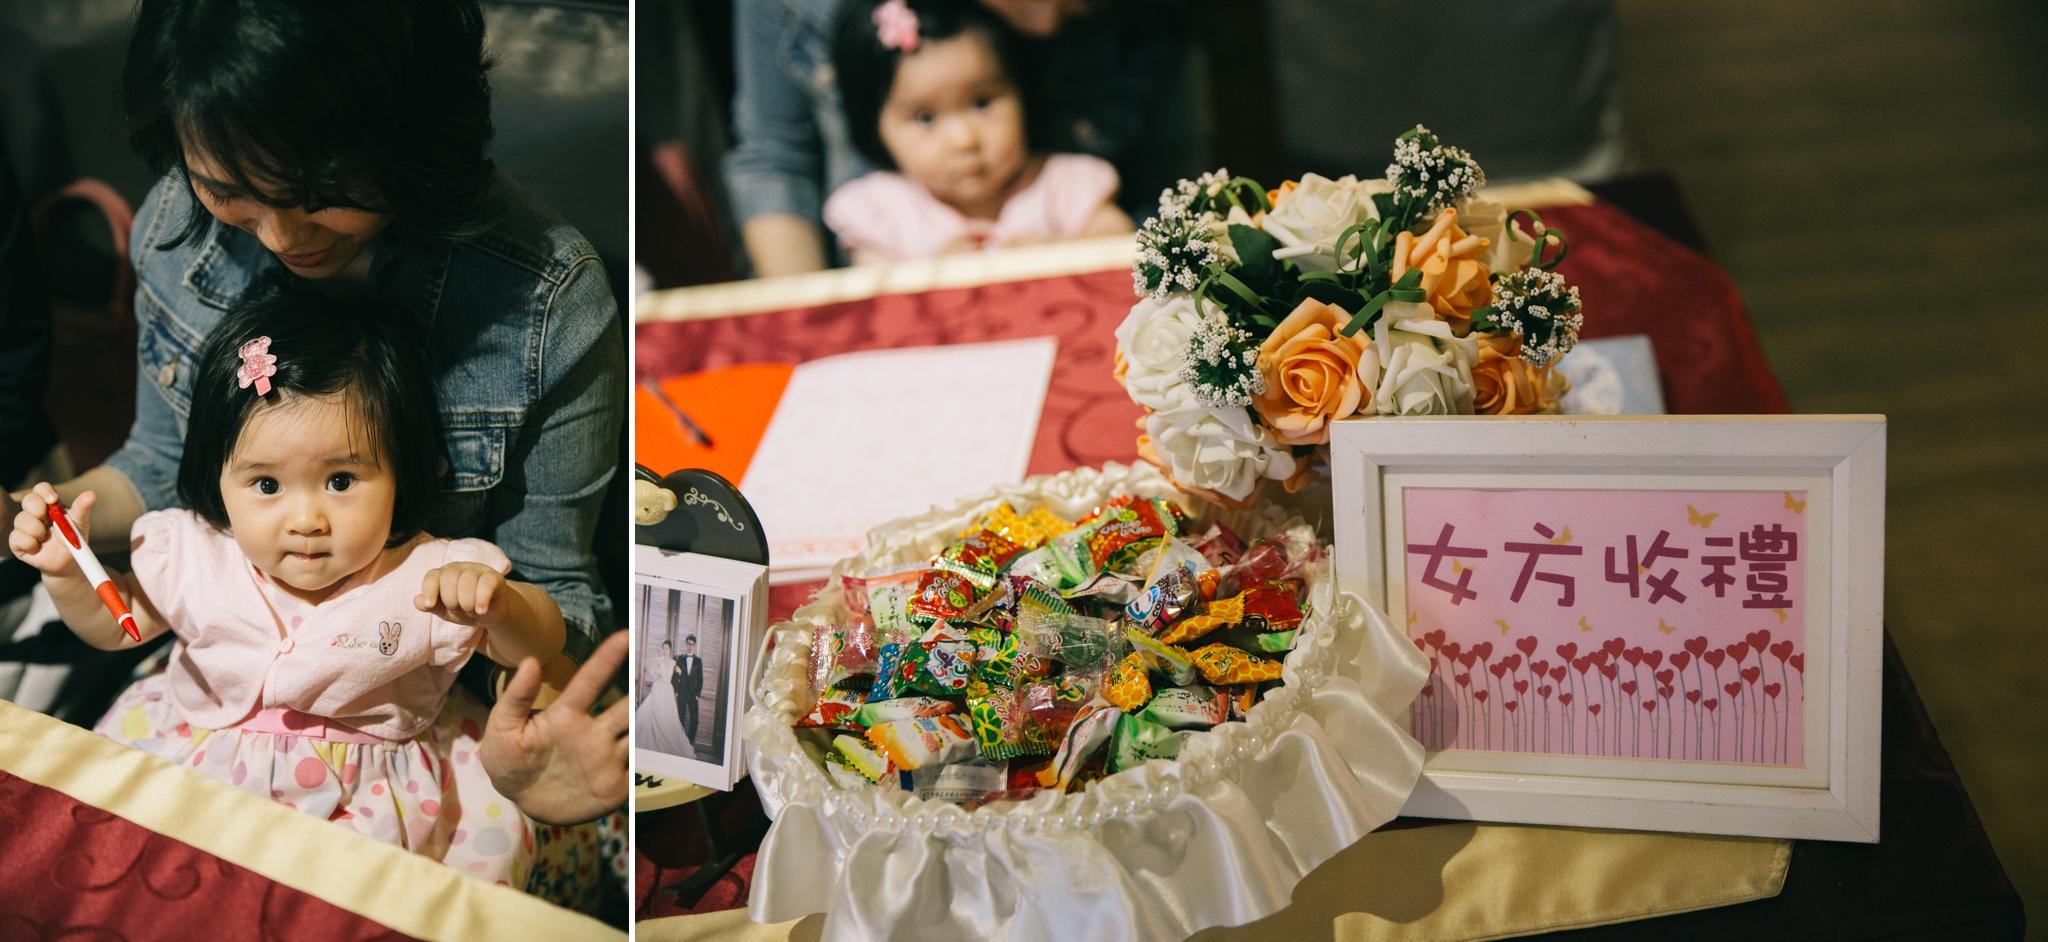 Tina+Nash-wedding-台北婚禮迎娶晚宴-新莊終身大事-107.jpg